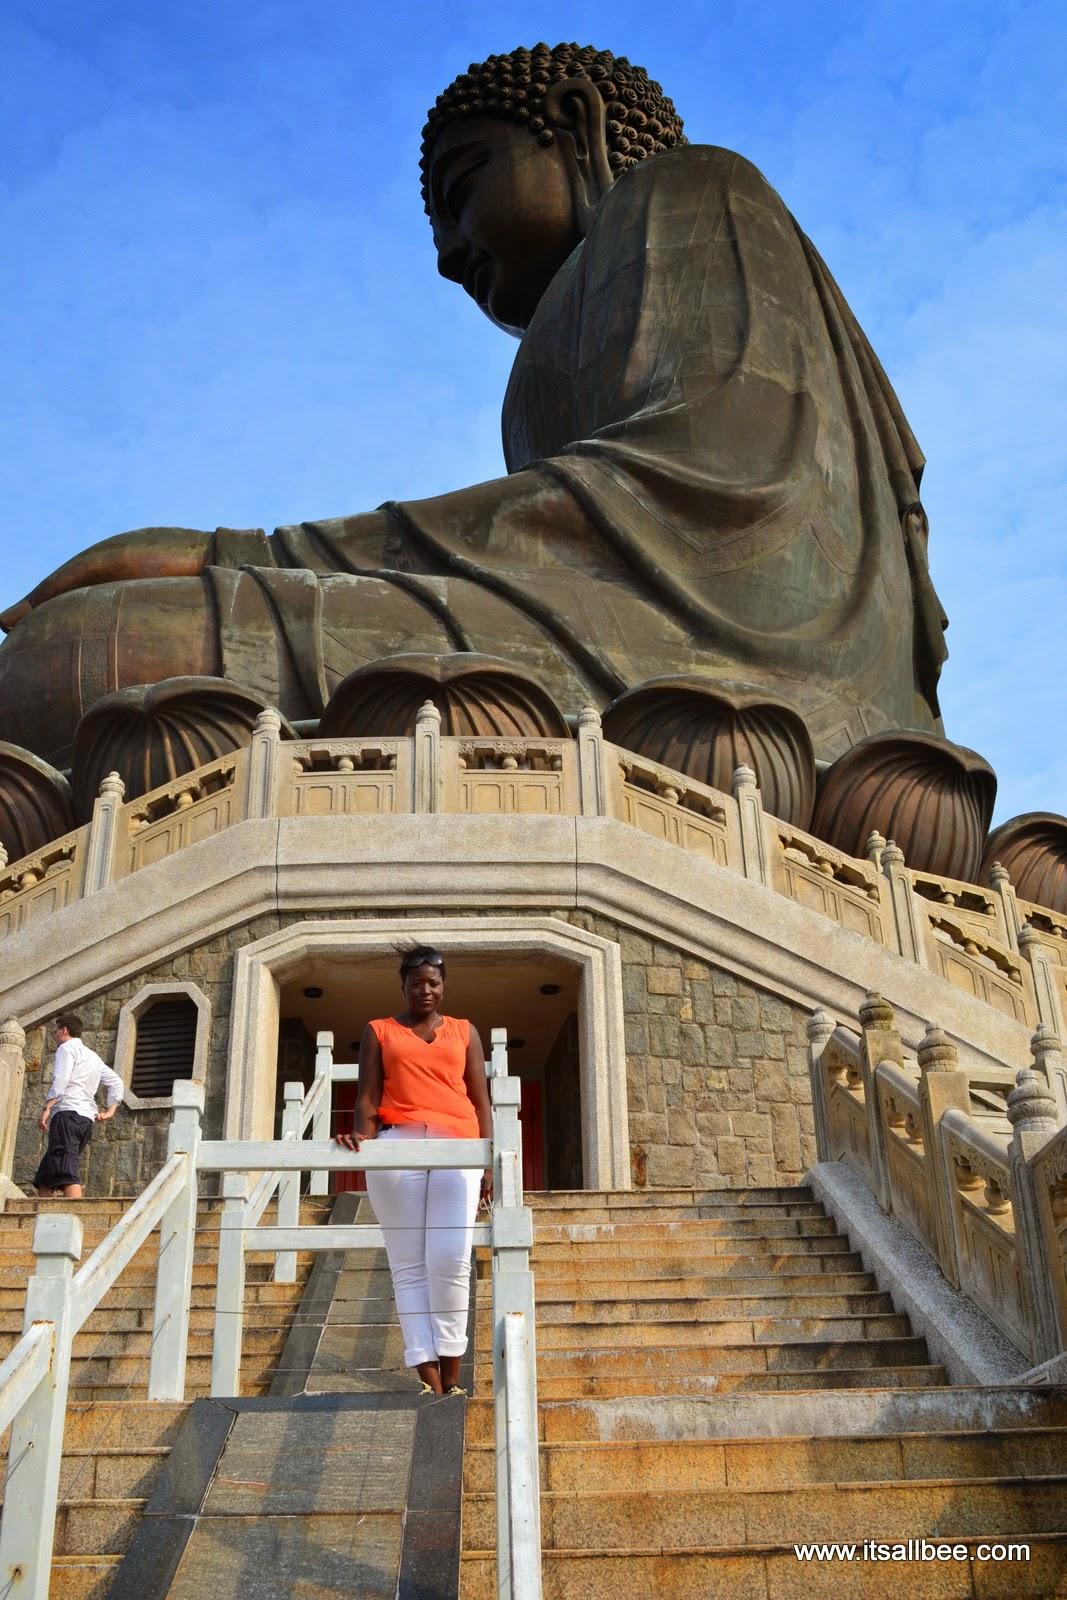 Hong Kong Lantau Island Big Buddha - Bianca